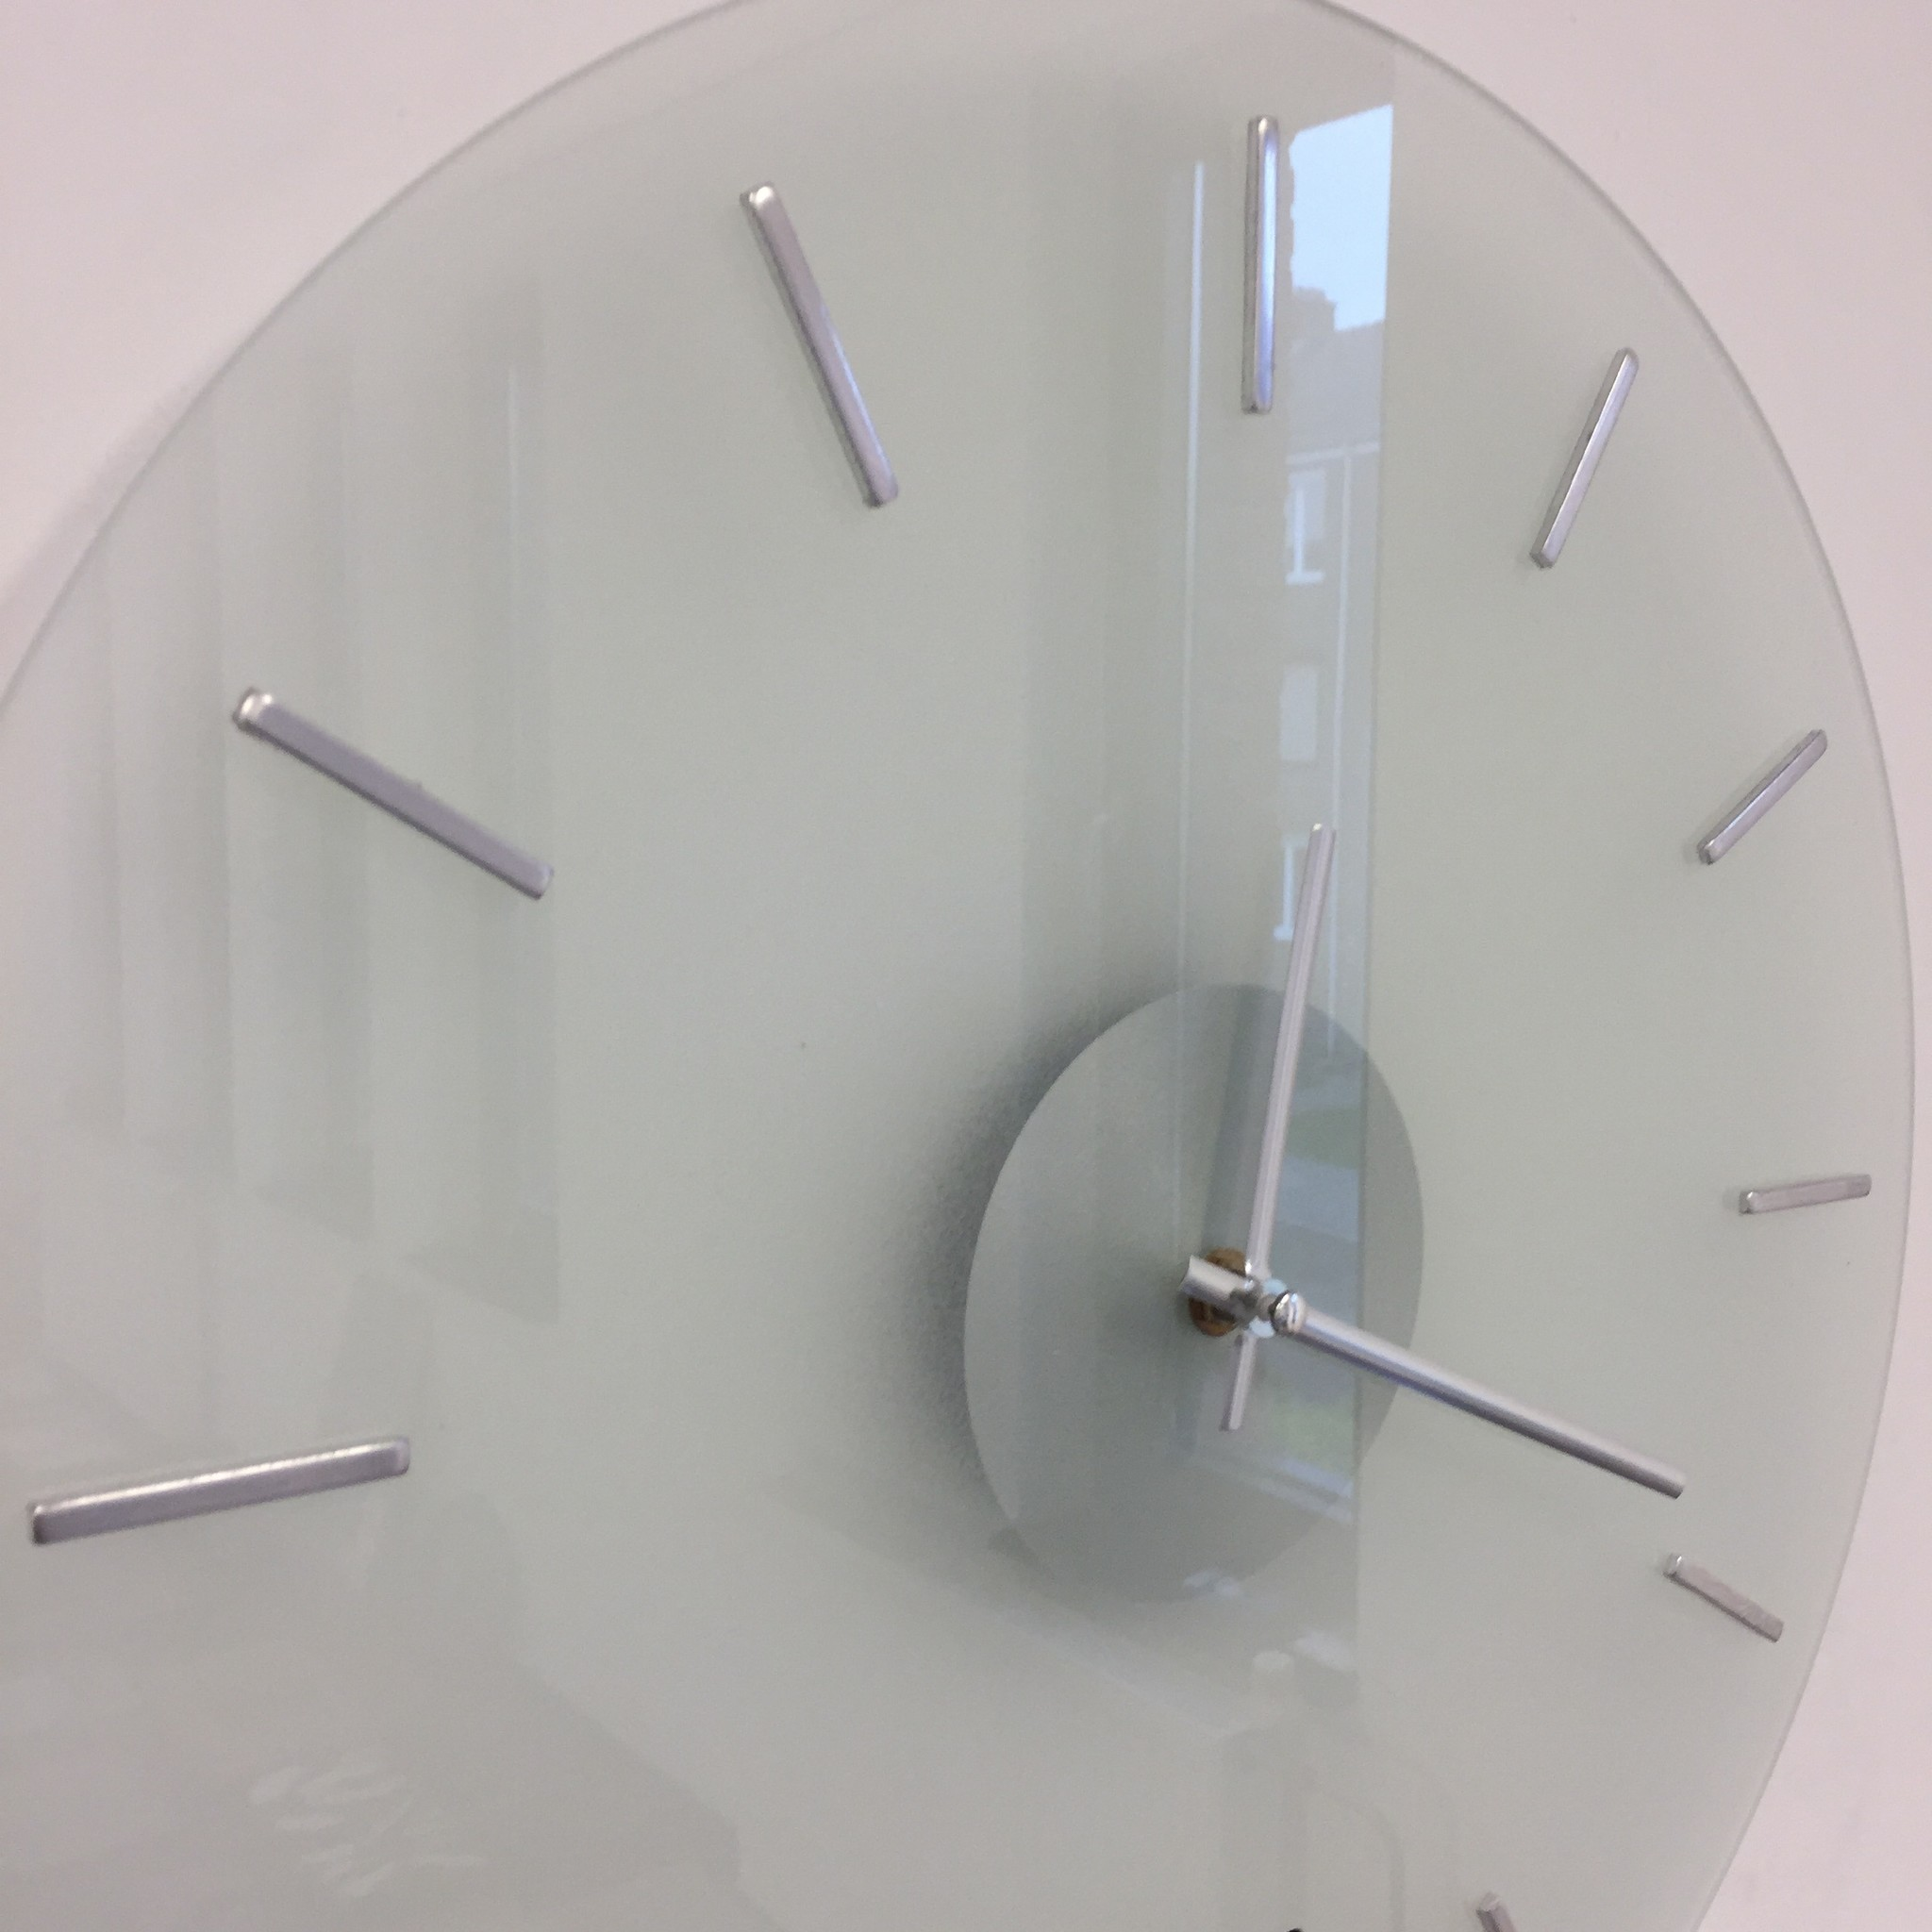 ChantalBrandO Wandklok POLAR WHITE modern design